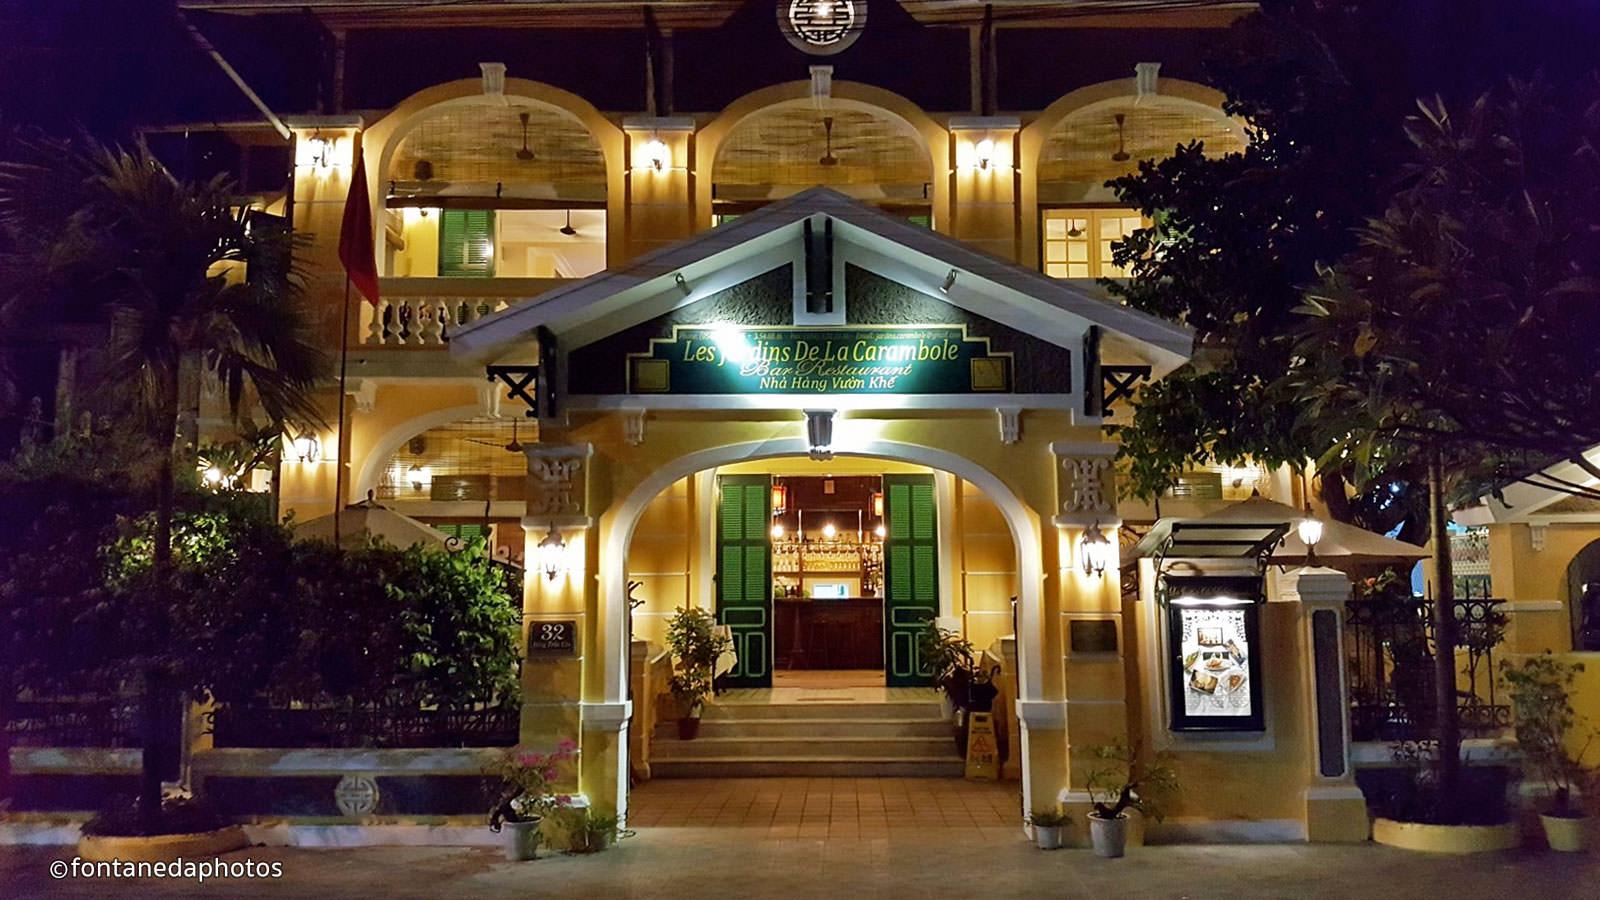 la carambole is one of hue fine dining restaurants